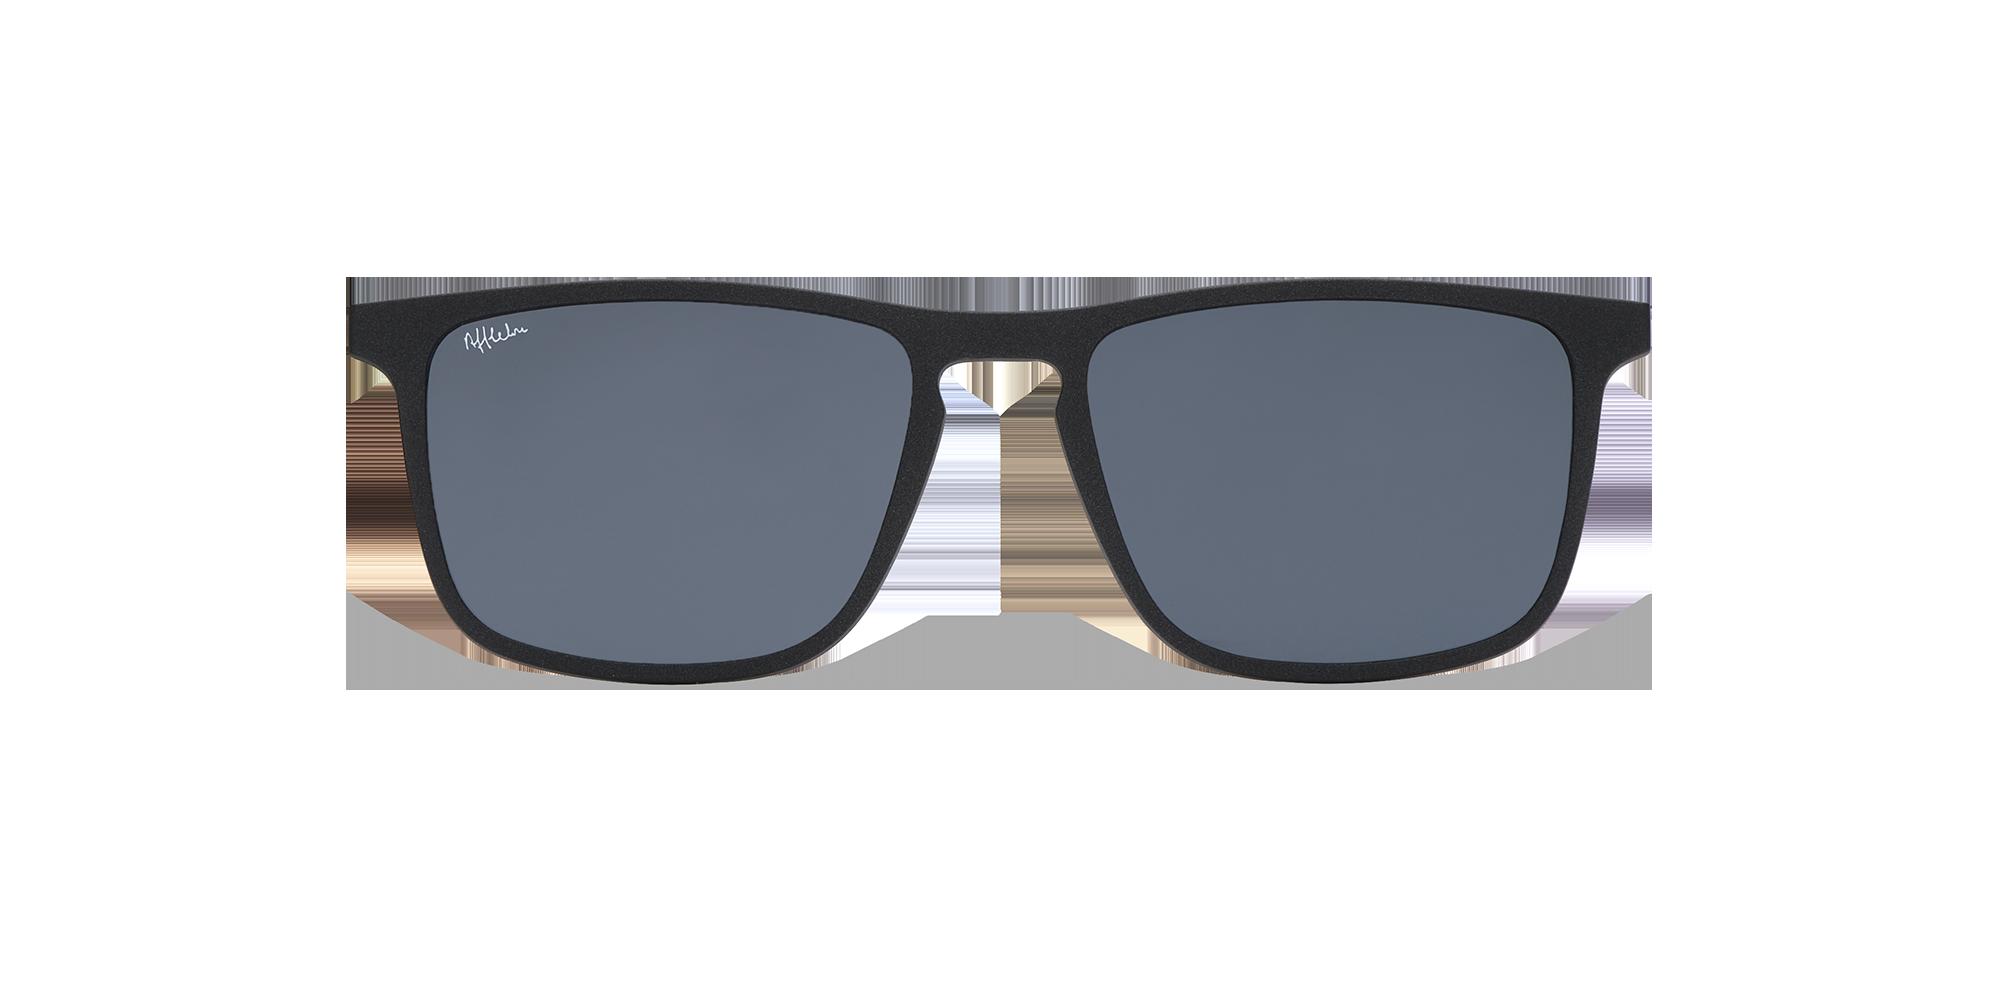 afflelou/france/products/smart_clip/clips_glasses/07630036428726_face.png